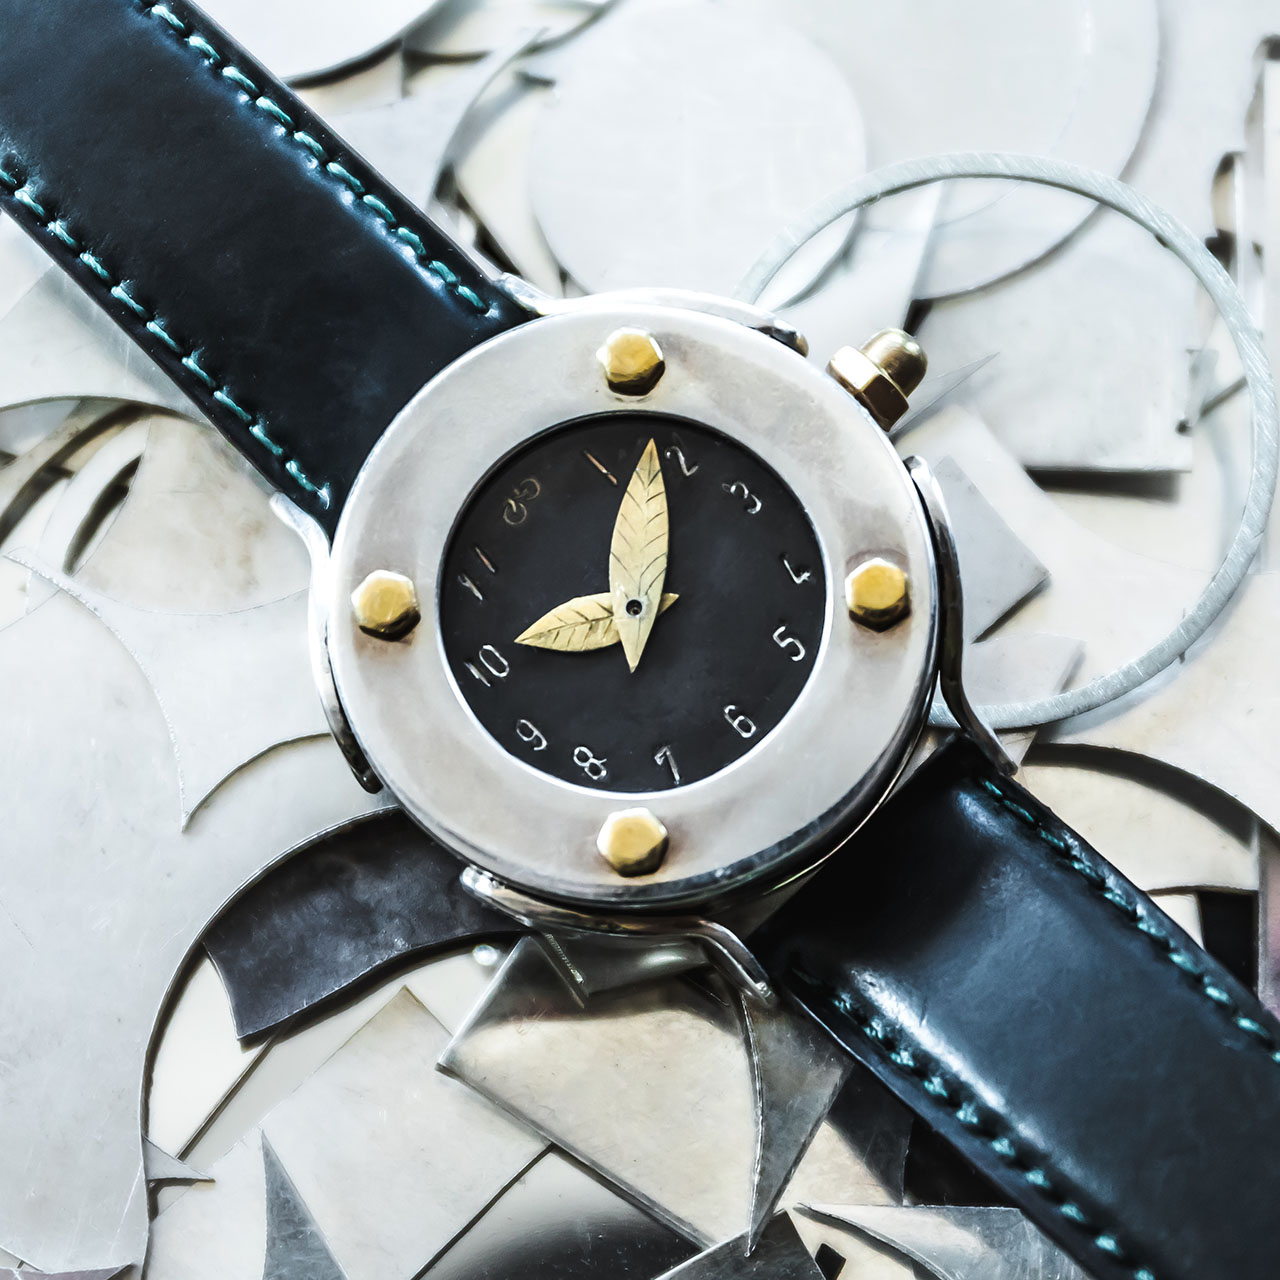 Armbanduhr anfertigen lassen - Atelier Horloges - Tortuga Noir